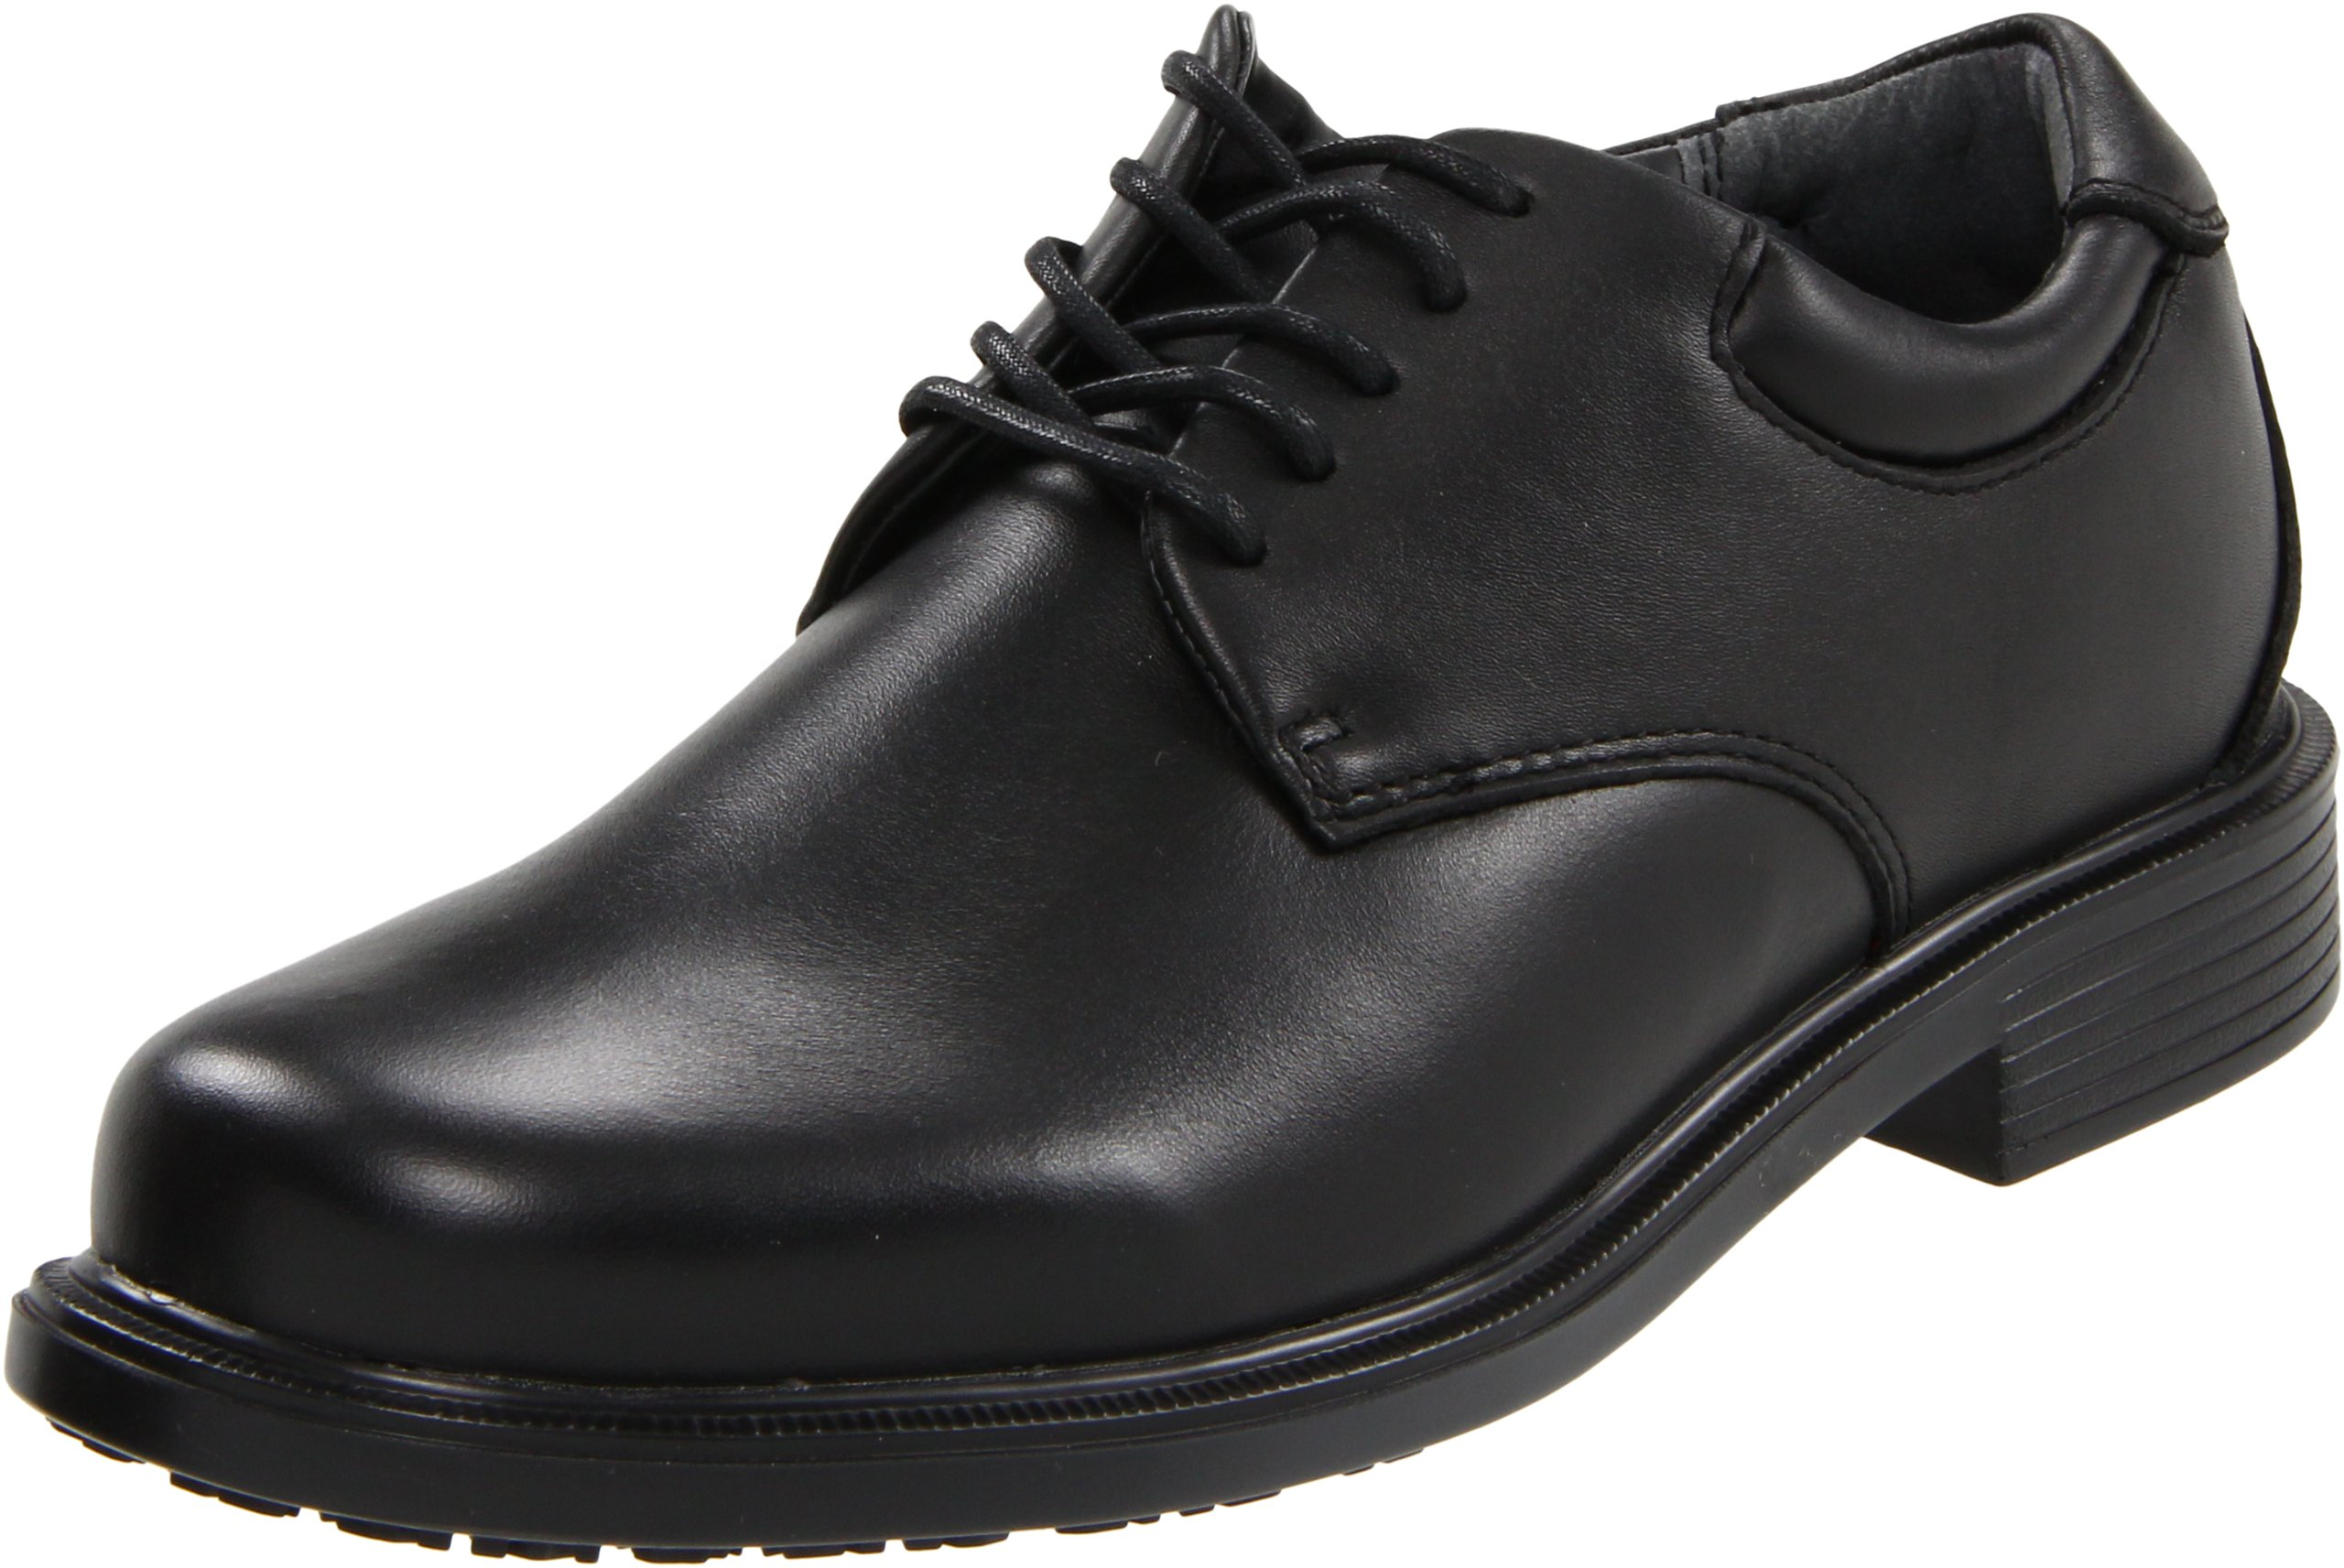 Rockport Work Men's RK6522 Work Shoe,Black,12 W US by Rockport